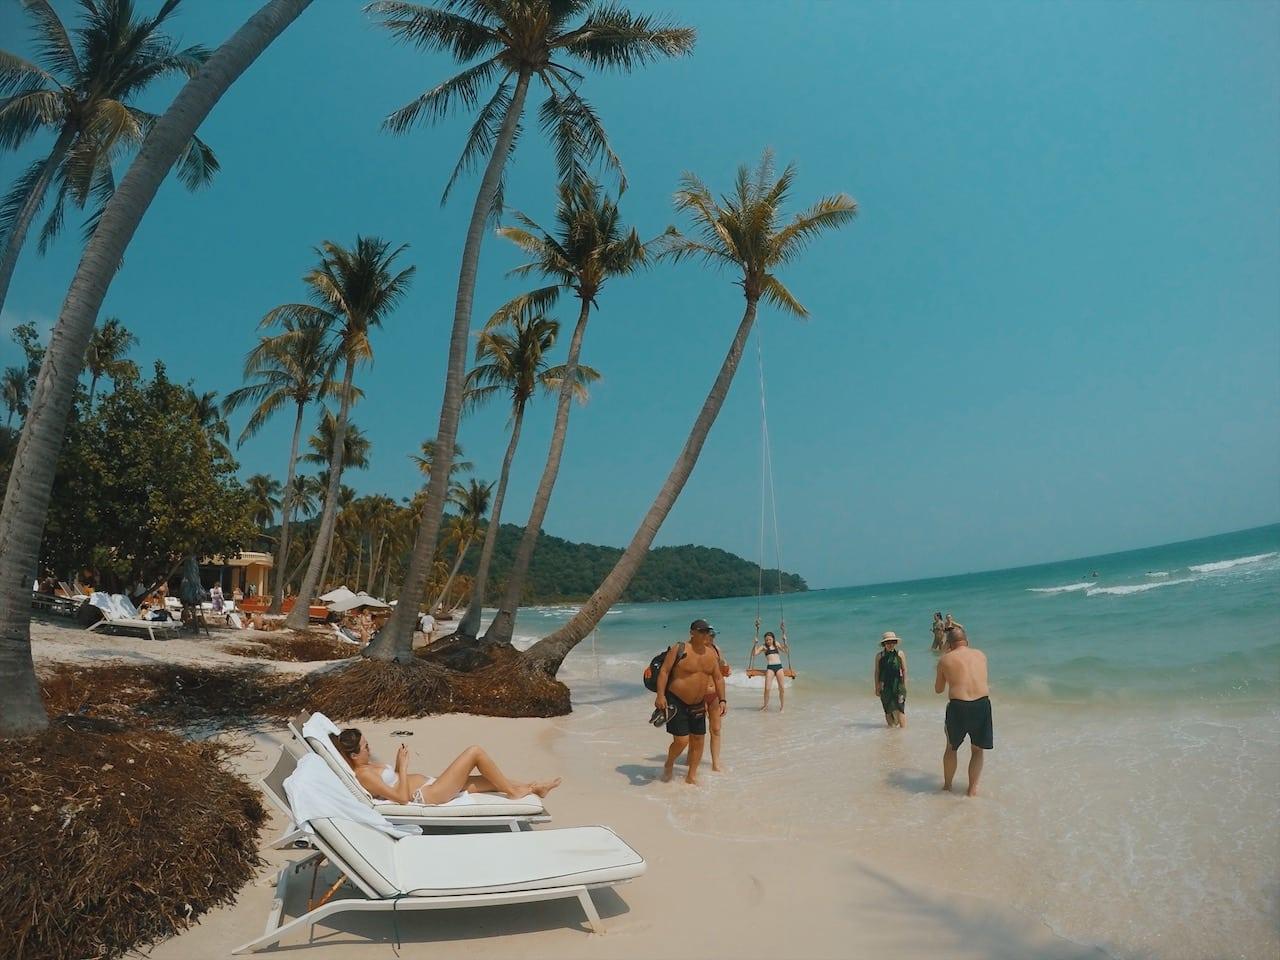 hustawka na sao beach wyspa phu quoc wietnam neverendingtravel.pl